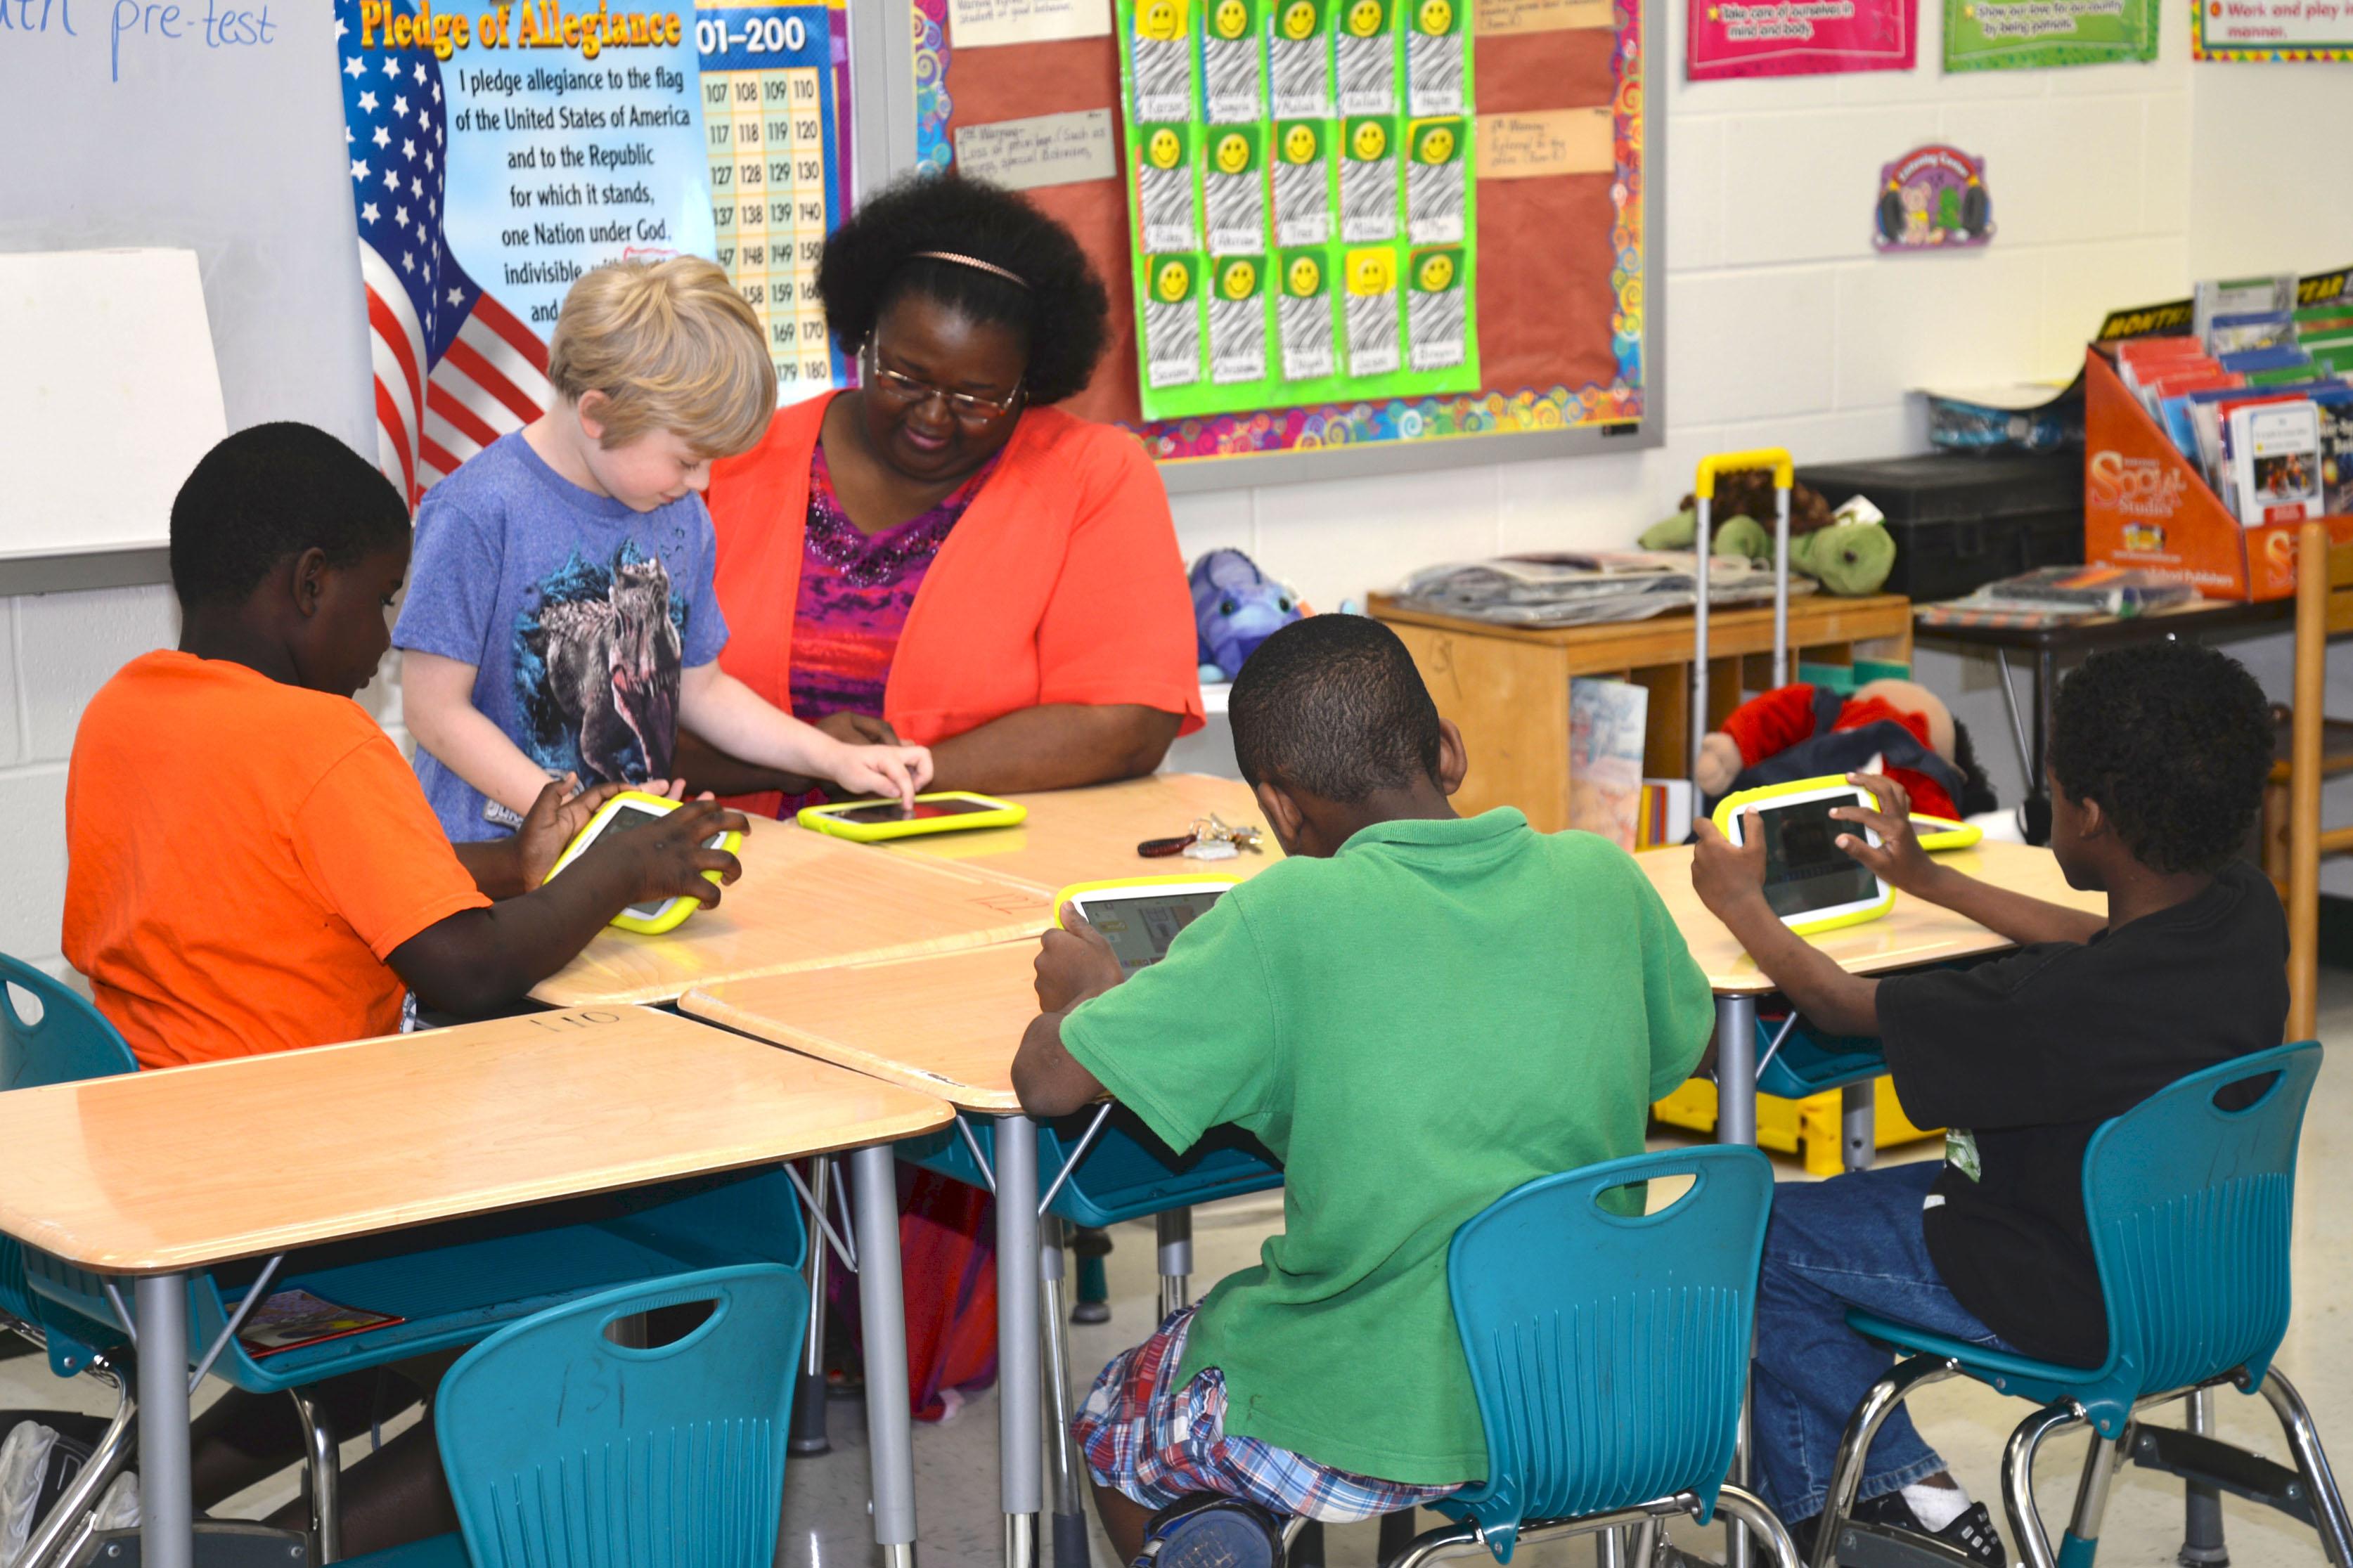 PBS KIDS ScratchJr Pine Bluff Group Work